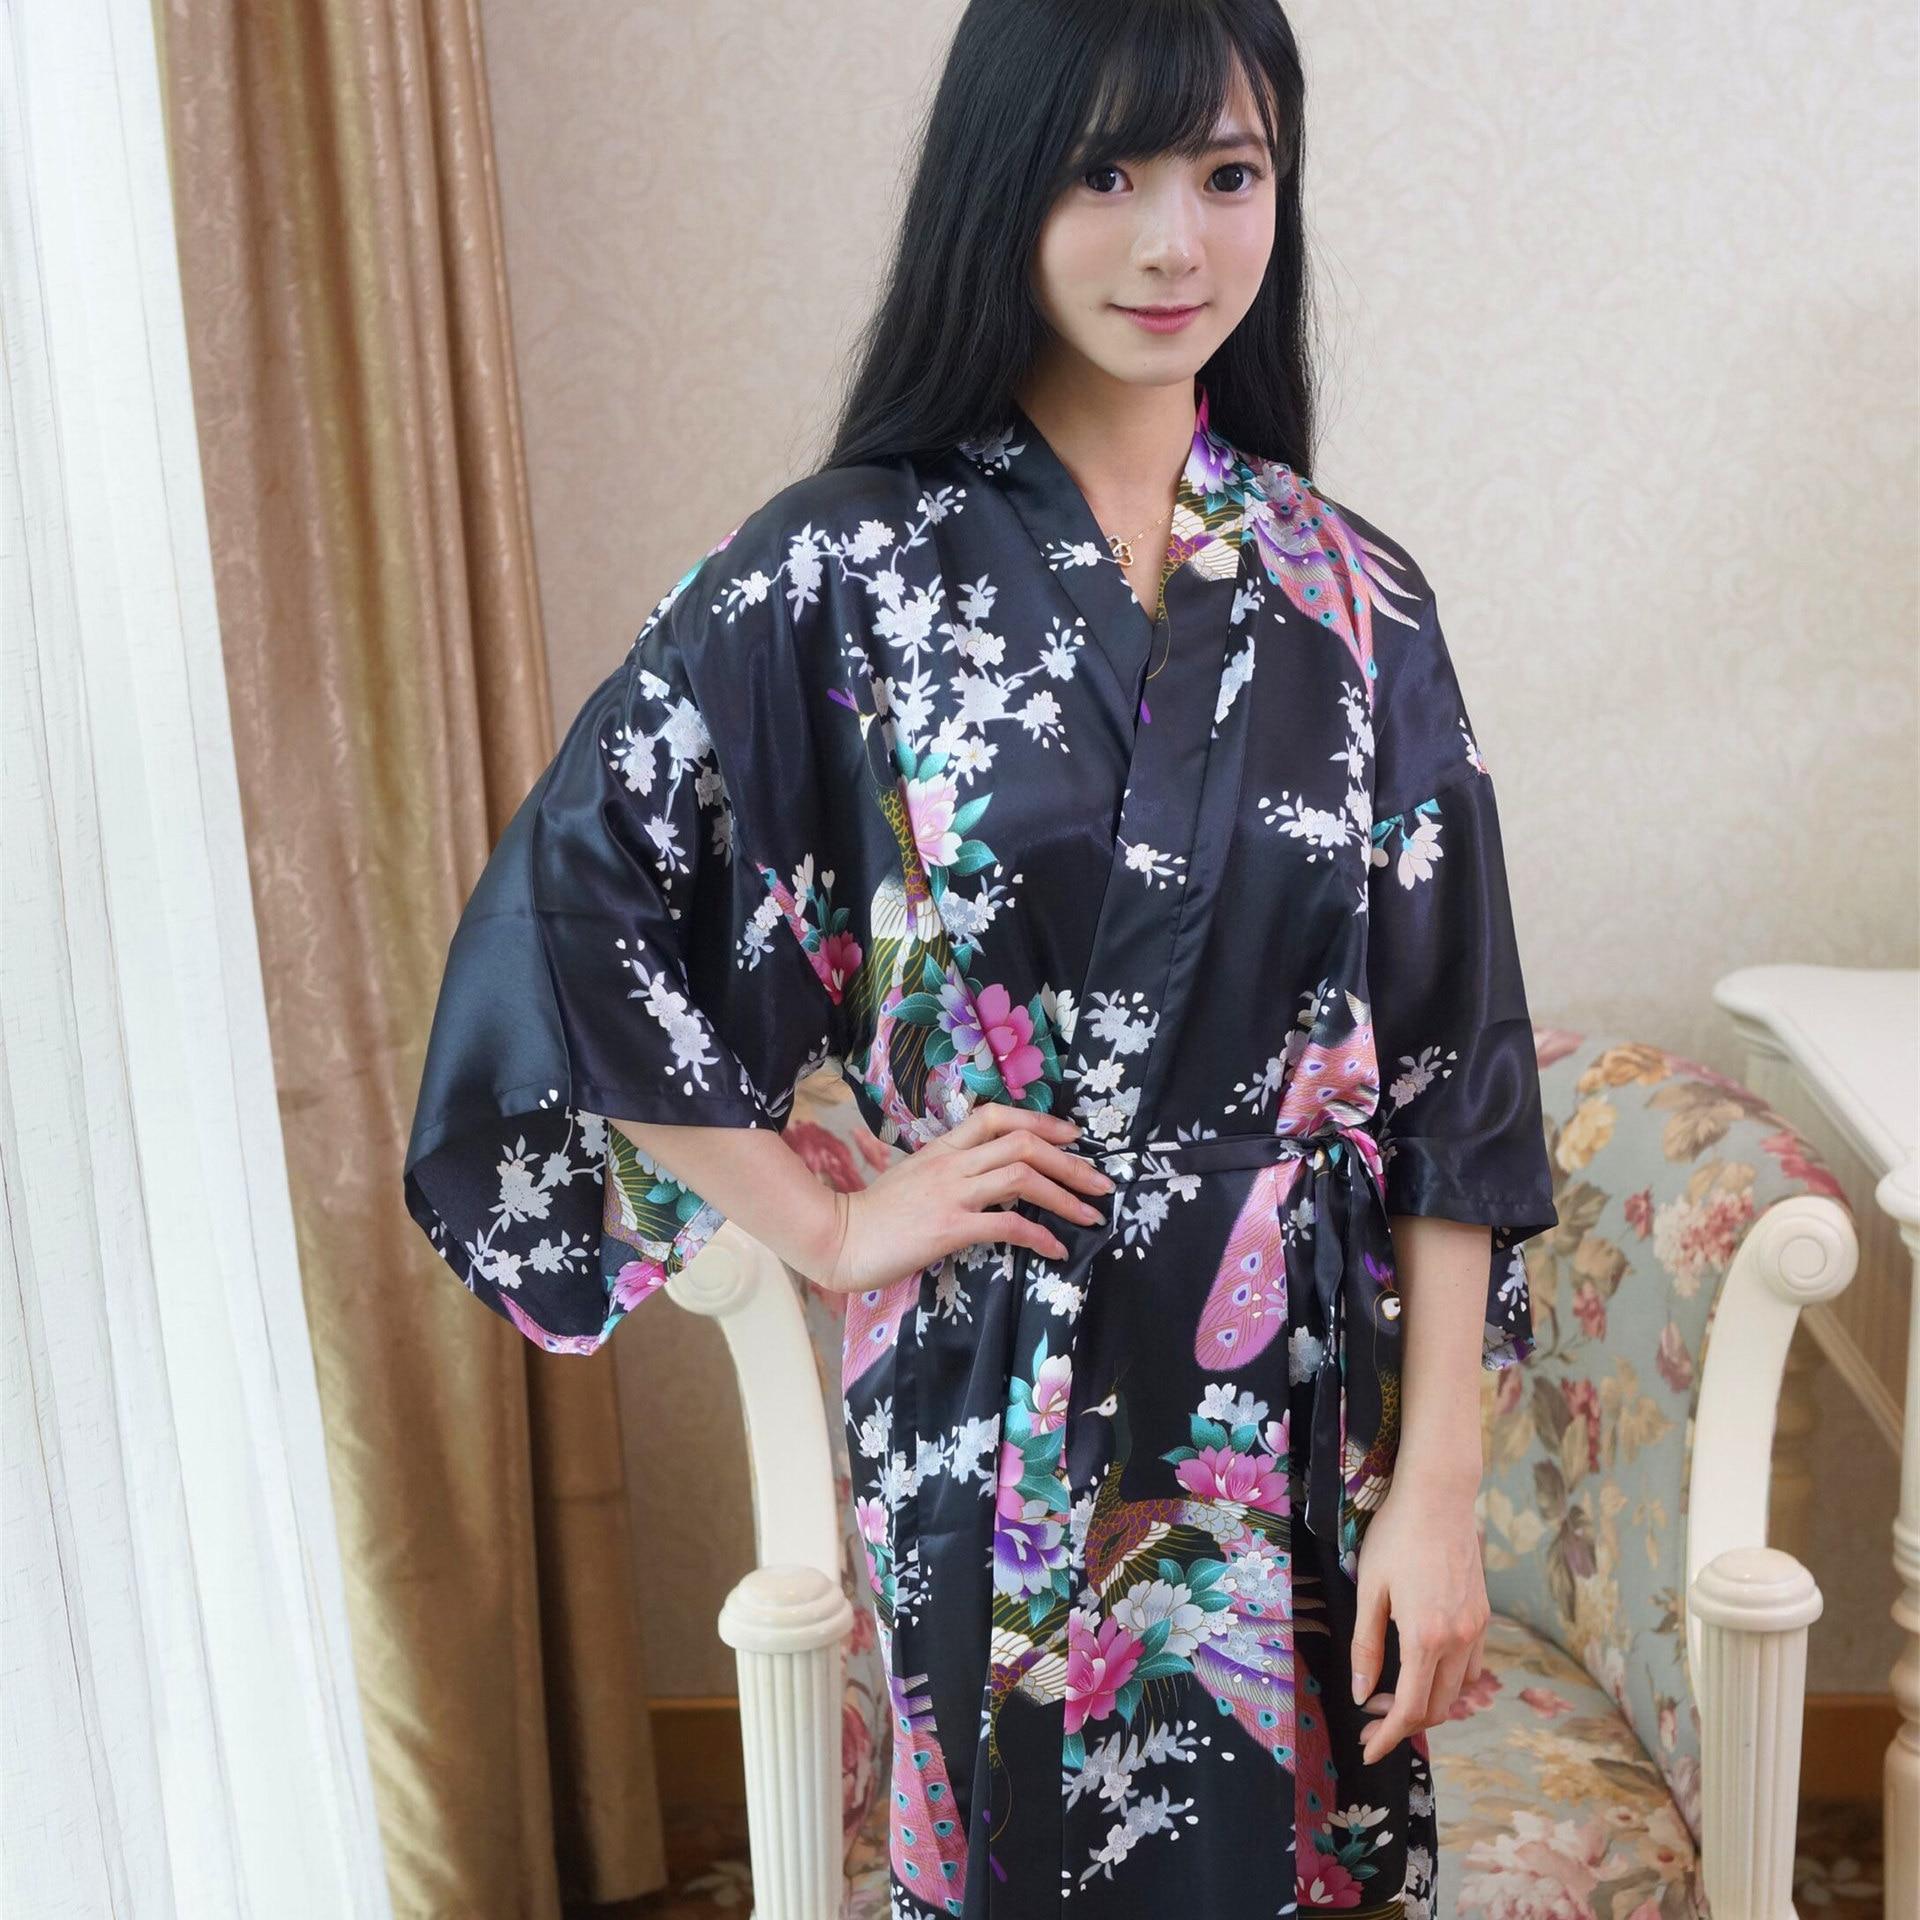 Albornoz japonés bata de baño de satén para mujer bata de seda larga dama de Honor presente Kimono de novia dama de Honor regalo